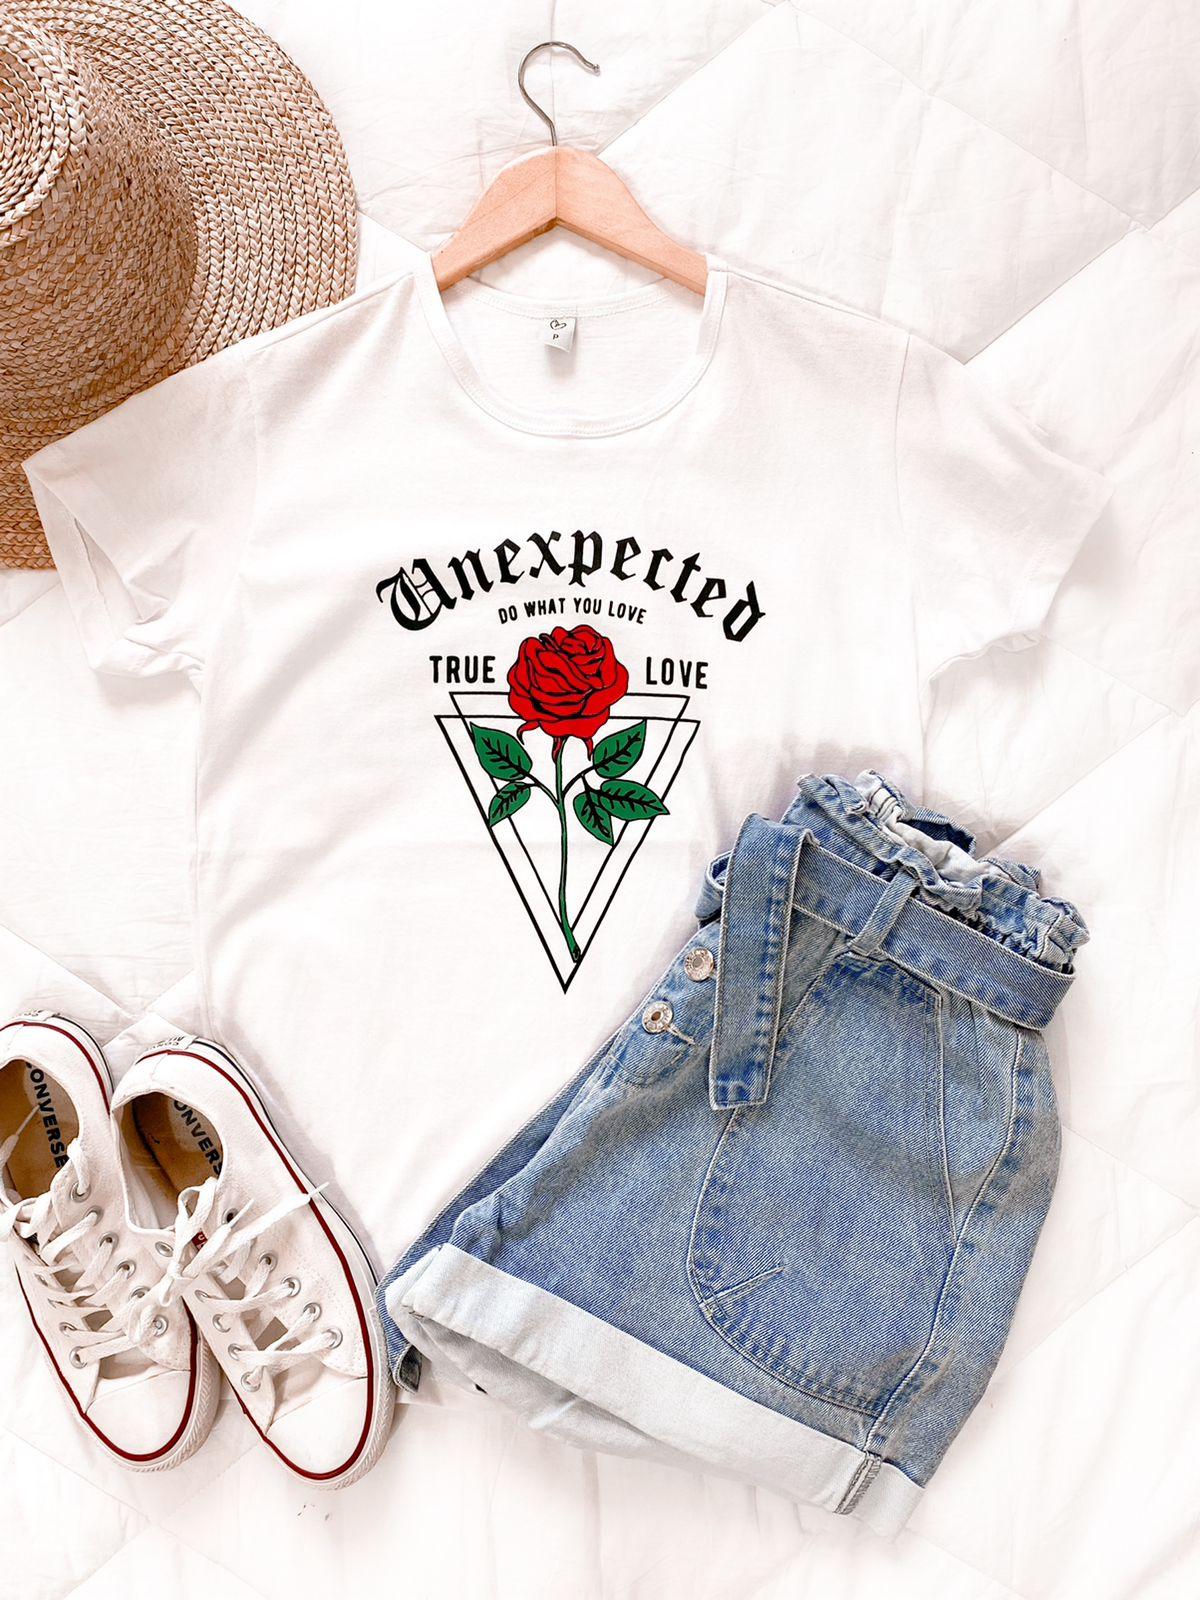 T-shirt Max true LOVE UNEXPECTED